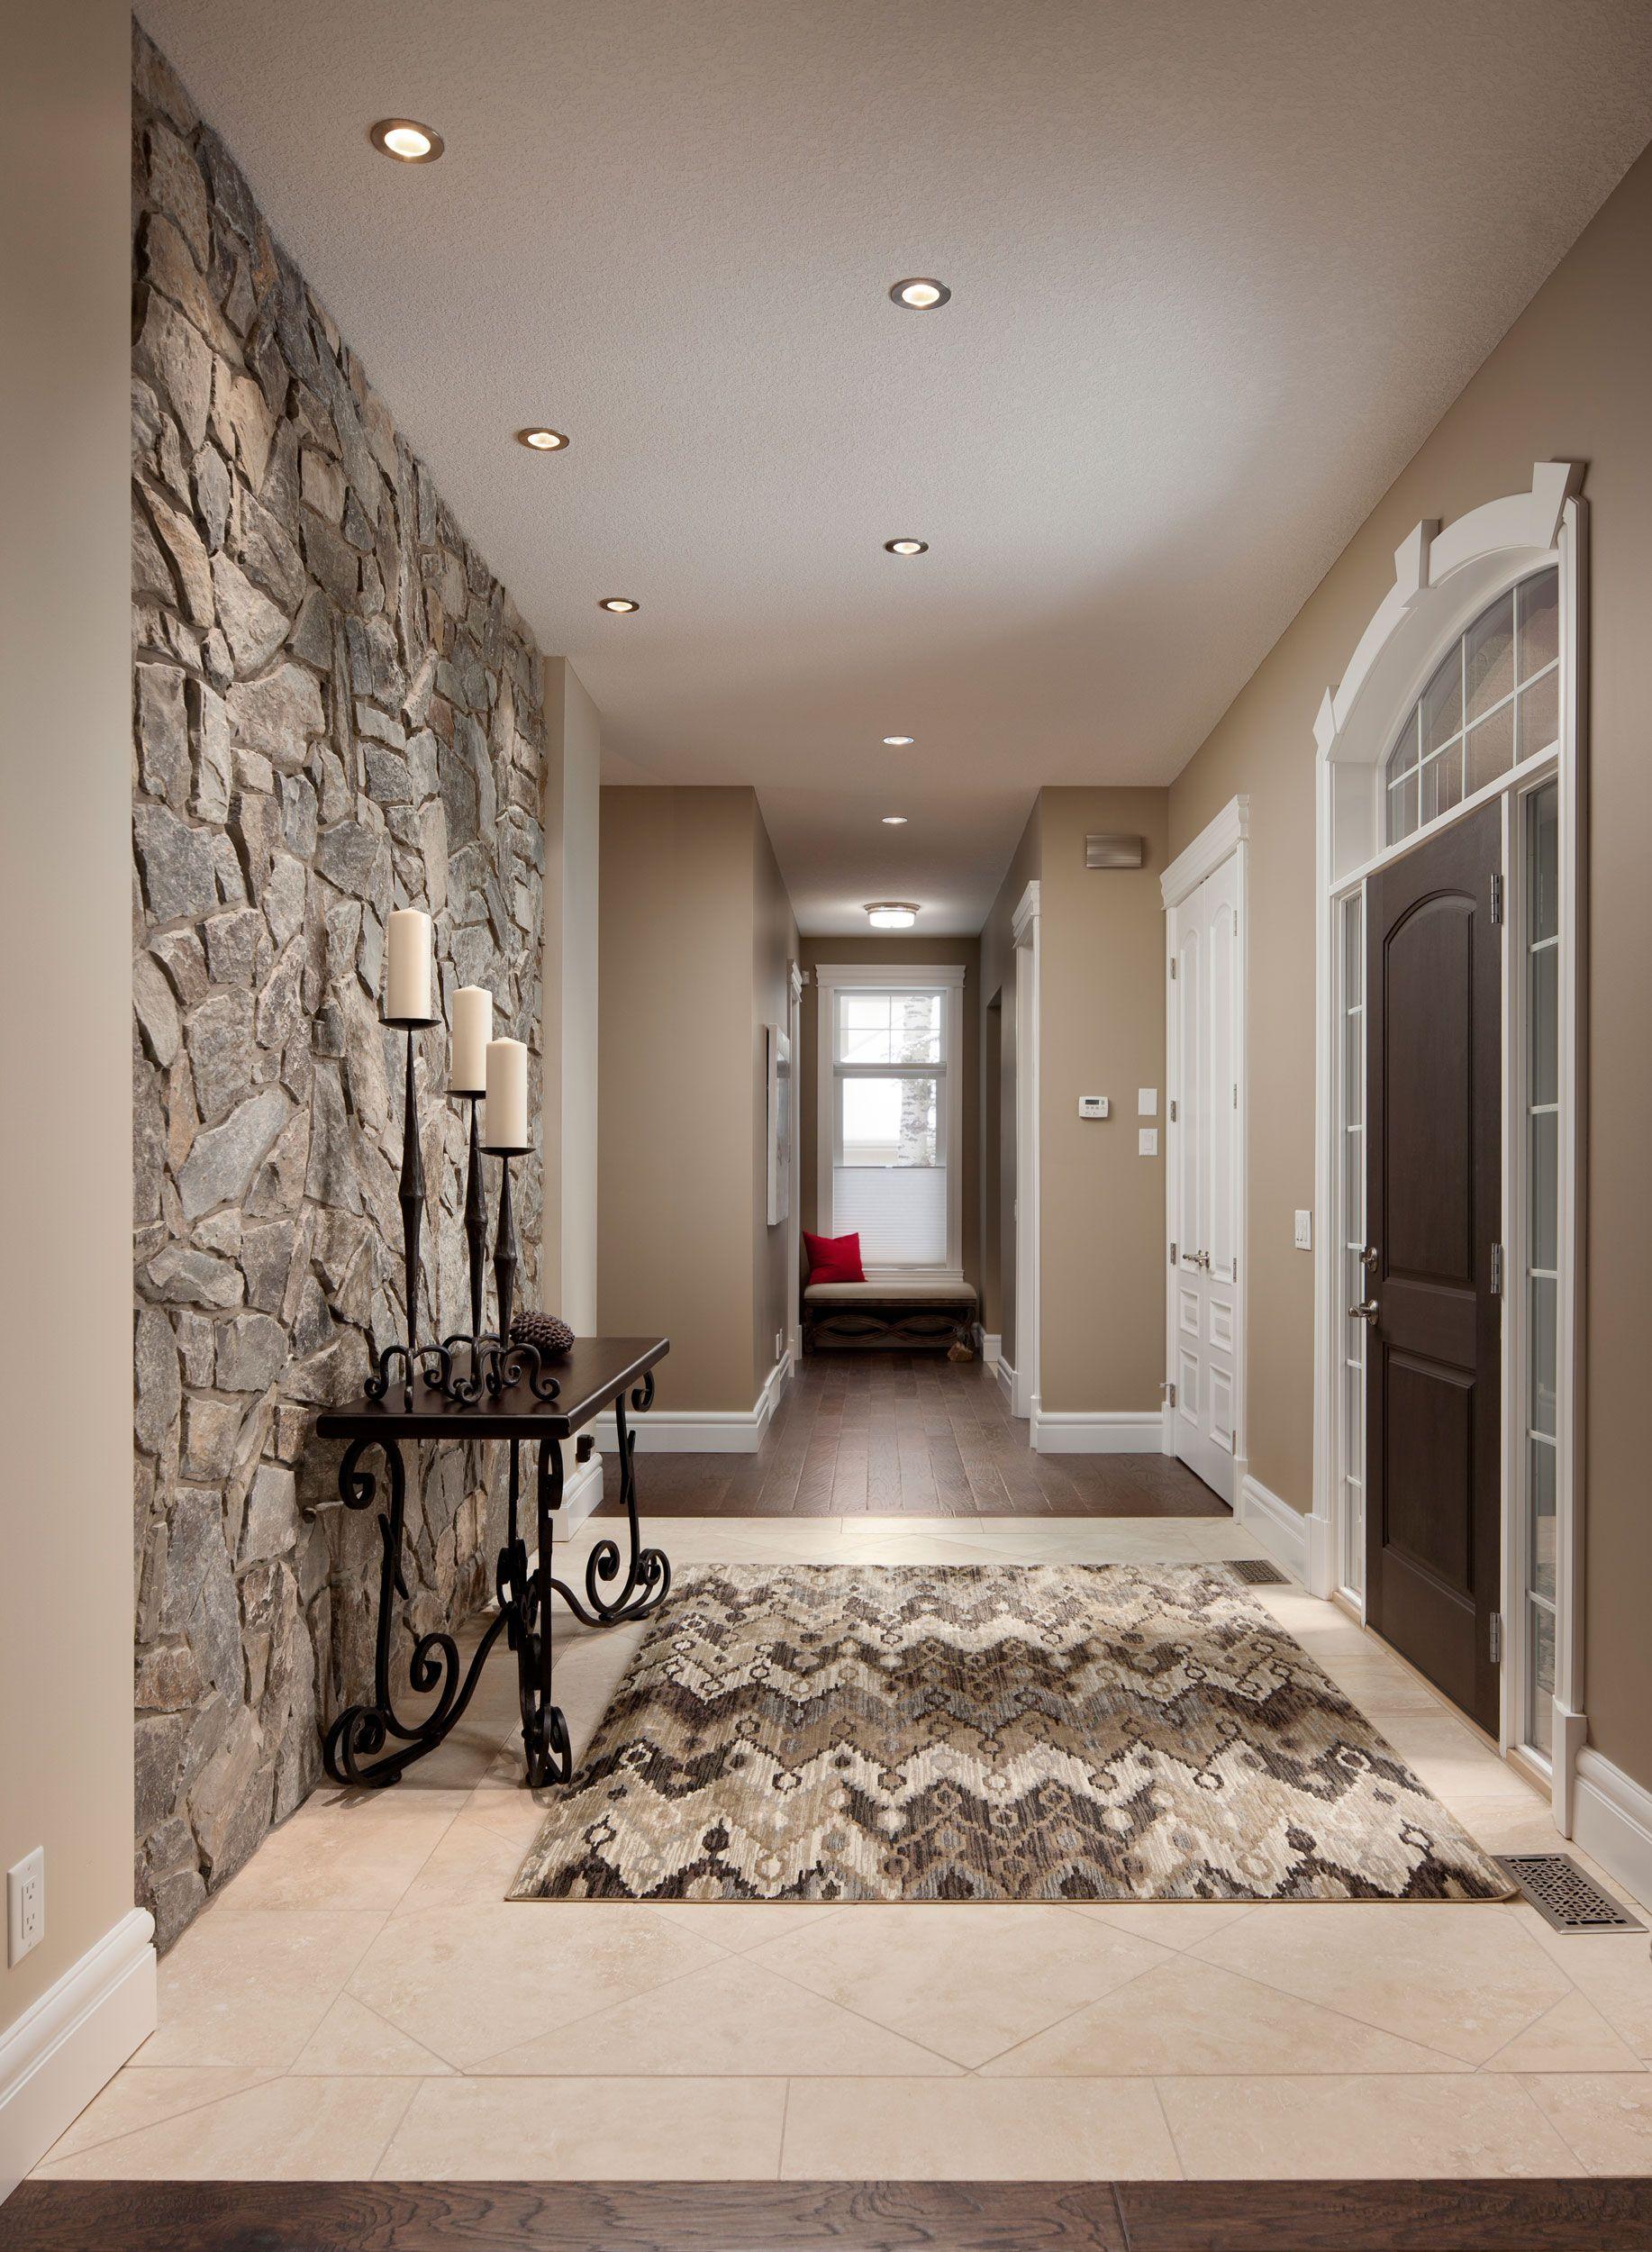 Zen Foyer Design : Moose mountain cottage thin veneer modern stone